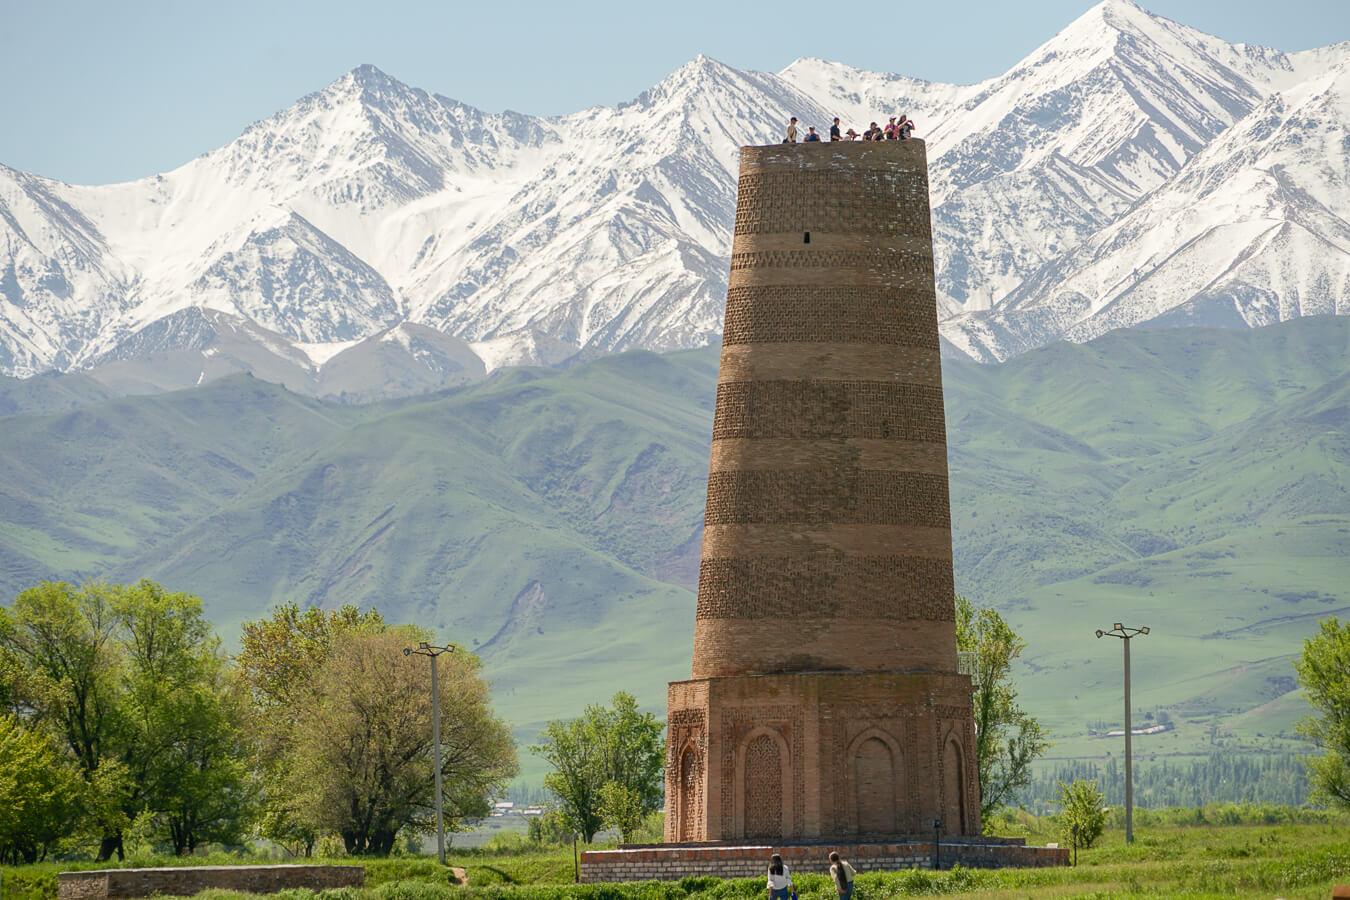 Burana minaret Turm in Kirgisistan